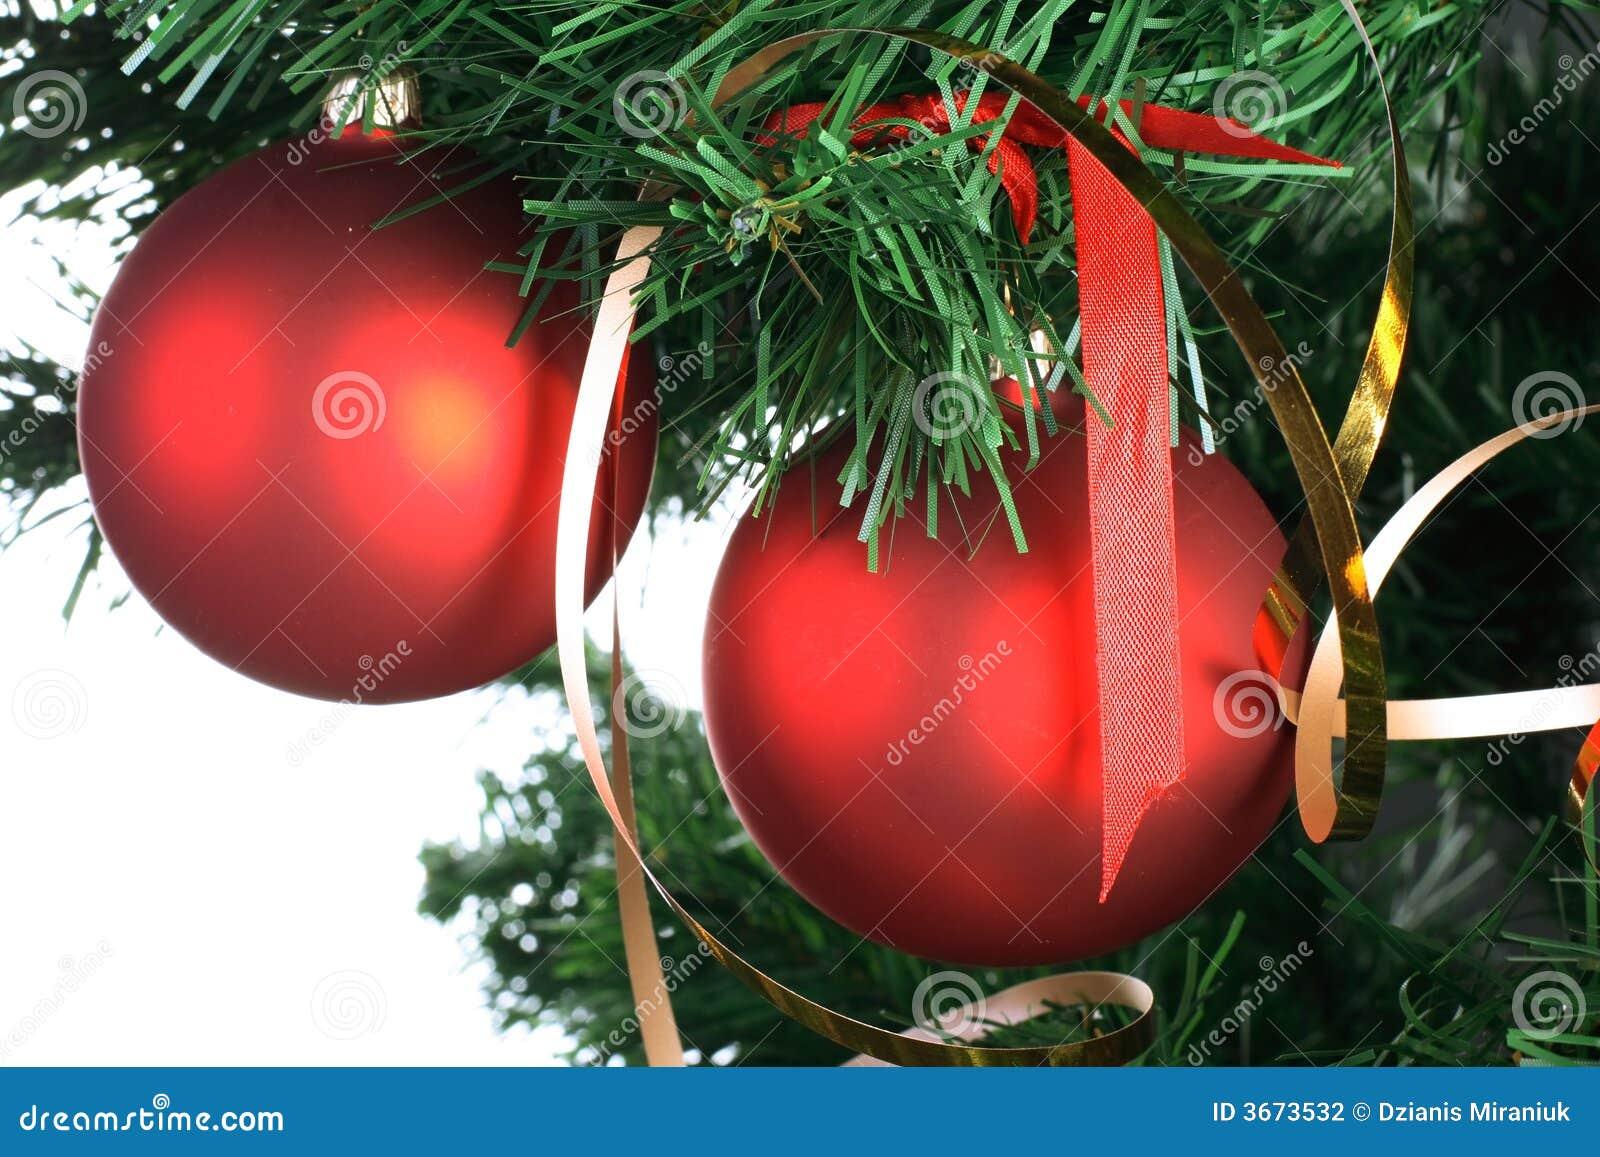 images of red balls big hanging balls 40 pics low hanging testicles